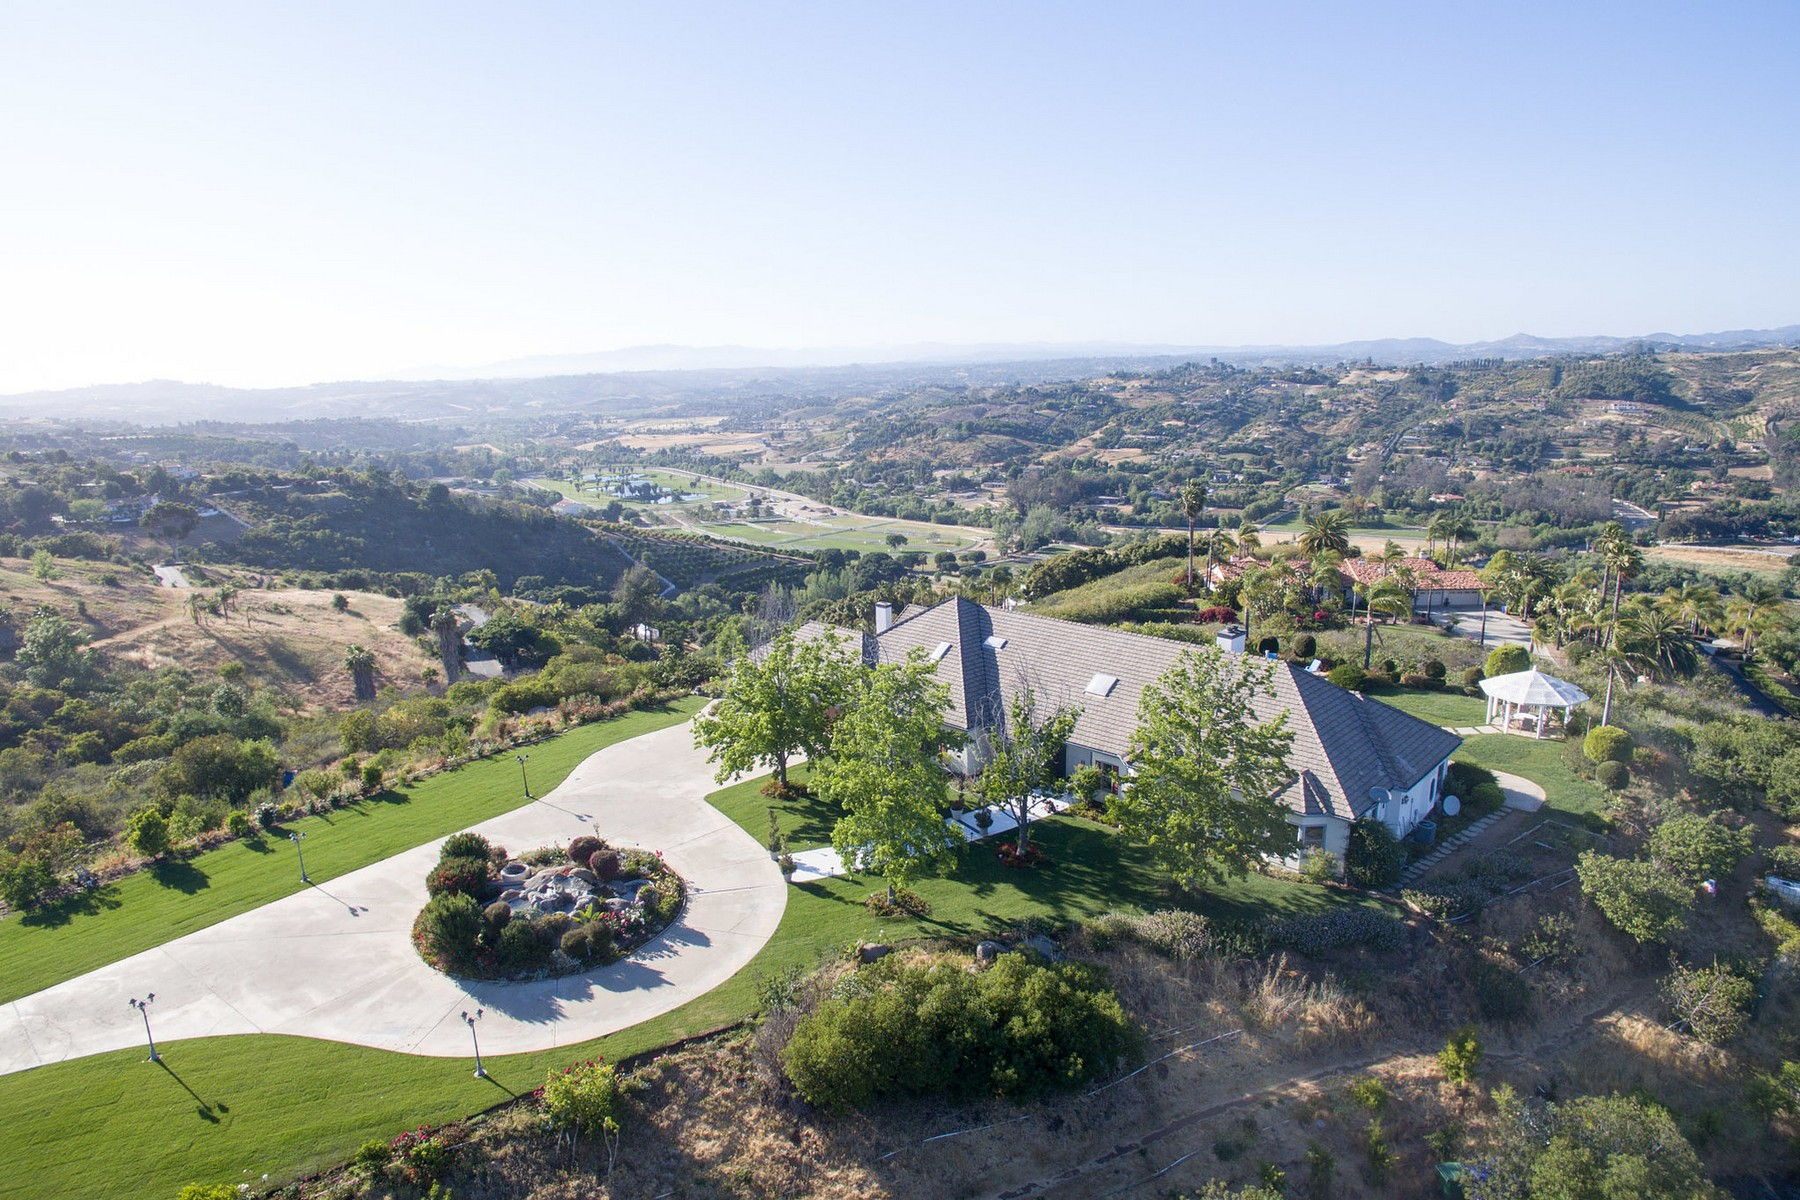 Single Family Home for Sale at 30417 Via Maria Elena Bonsall, California, 92003 United States